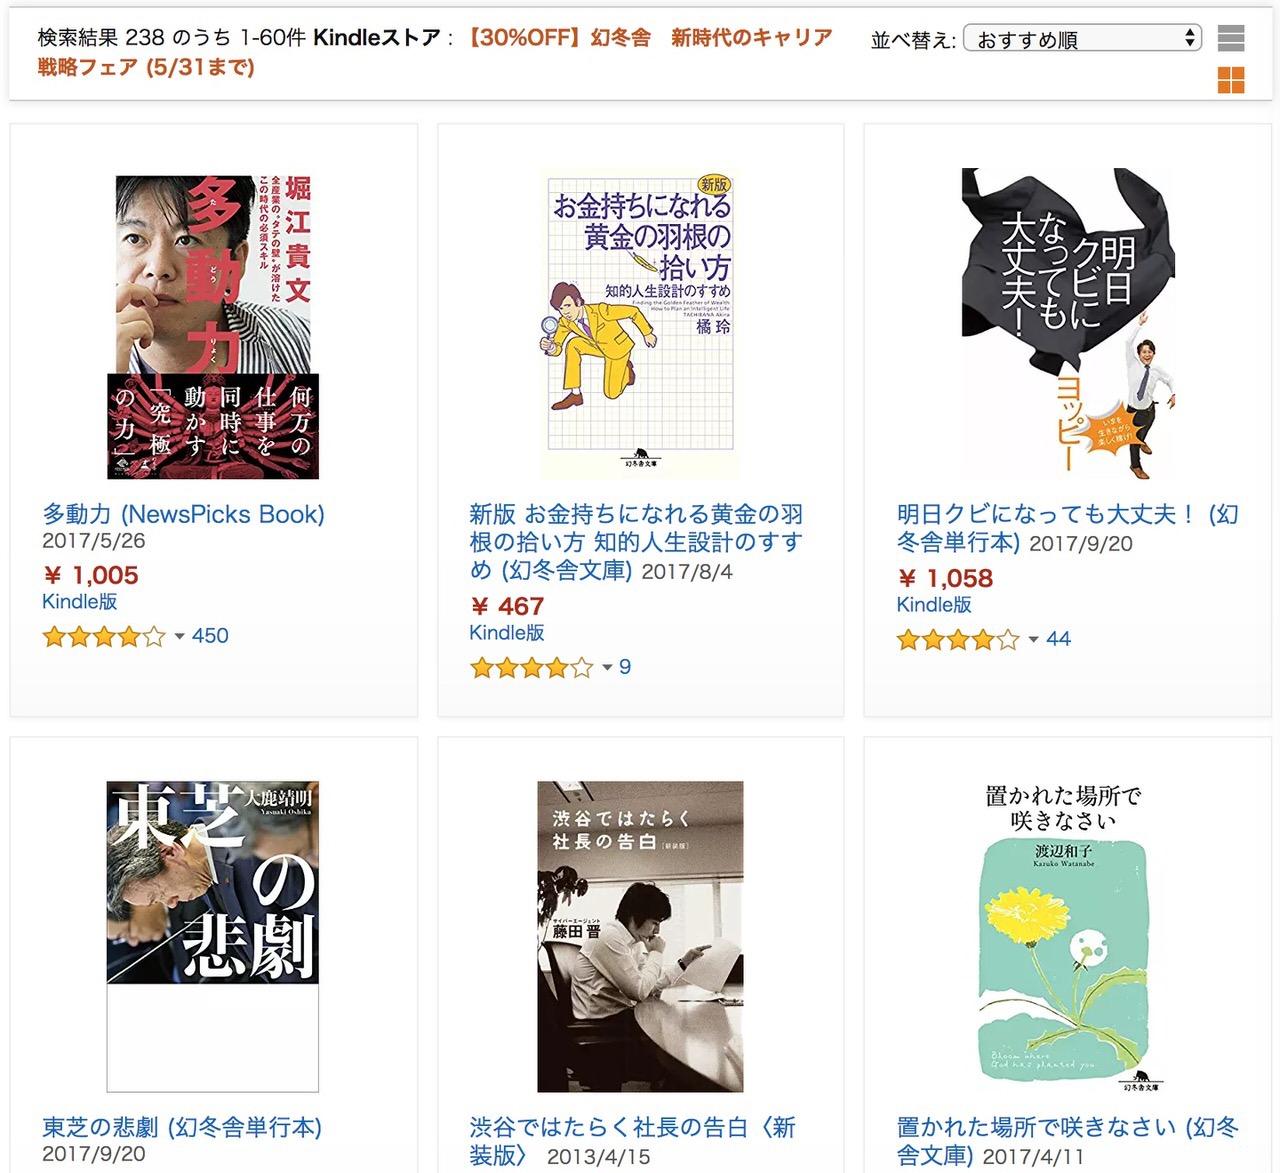 【Kindleセール】30%OFF「幻冬舎 新時代のキャリア戦略フェア」開催中(5/31まで)